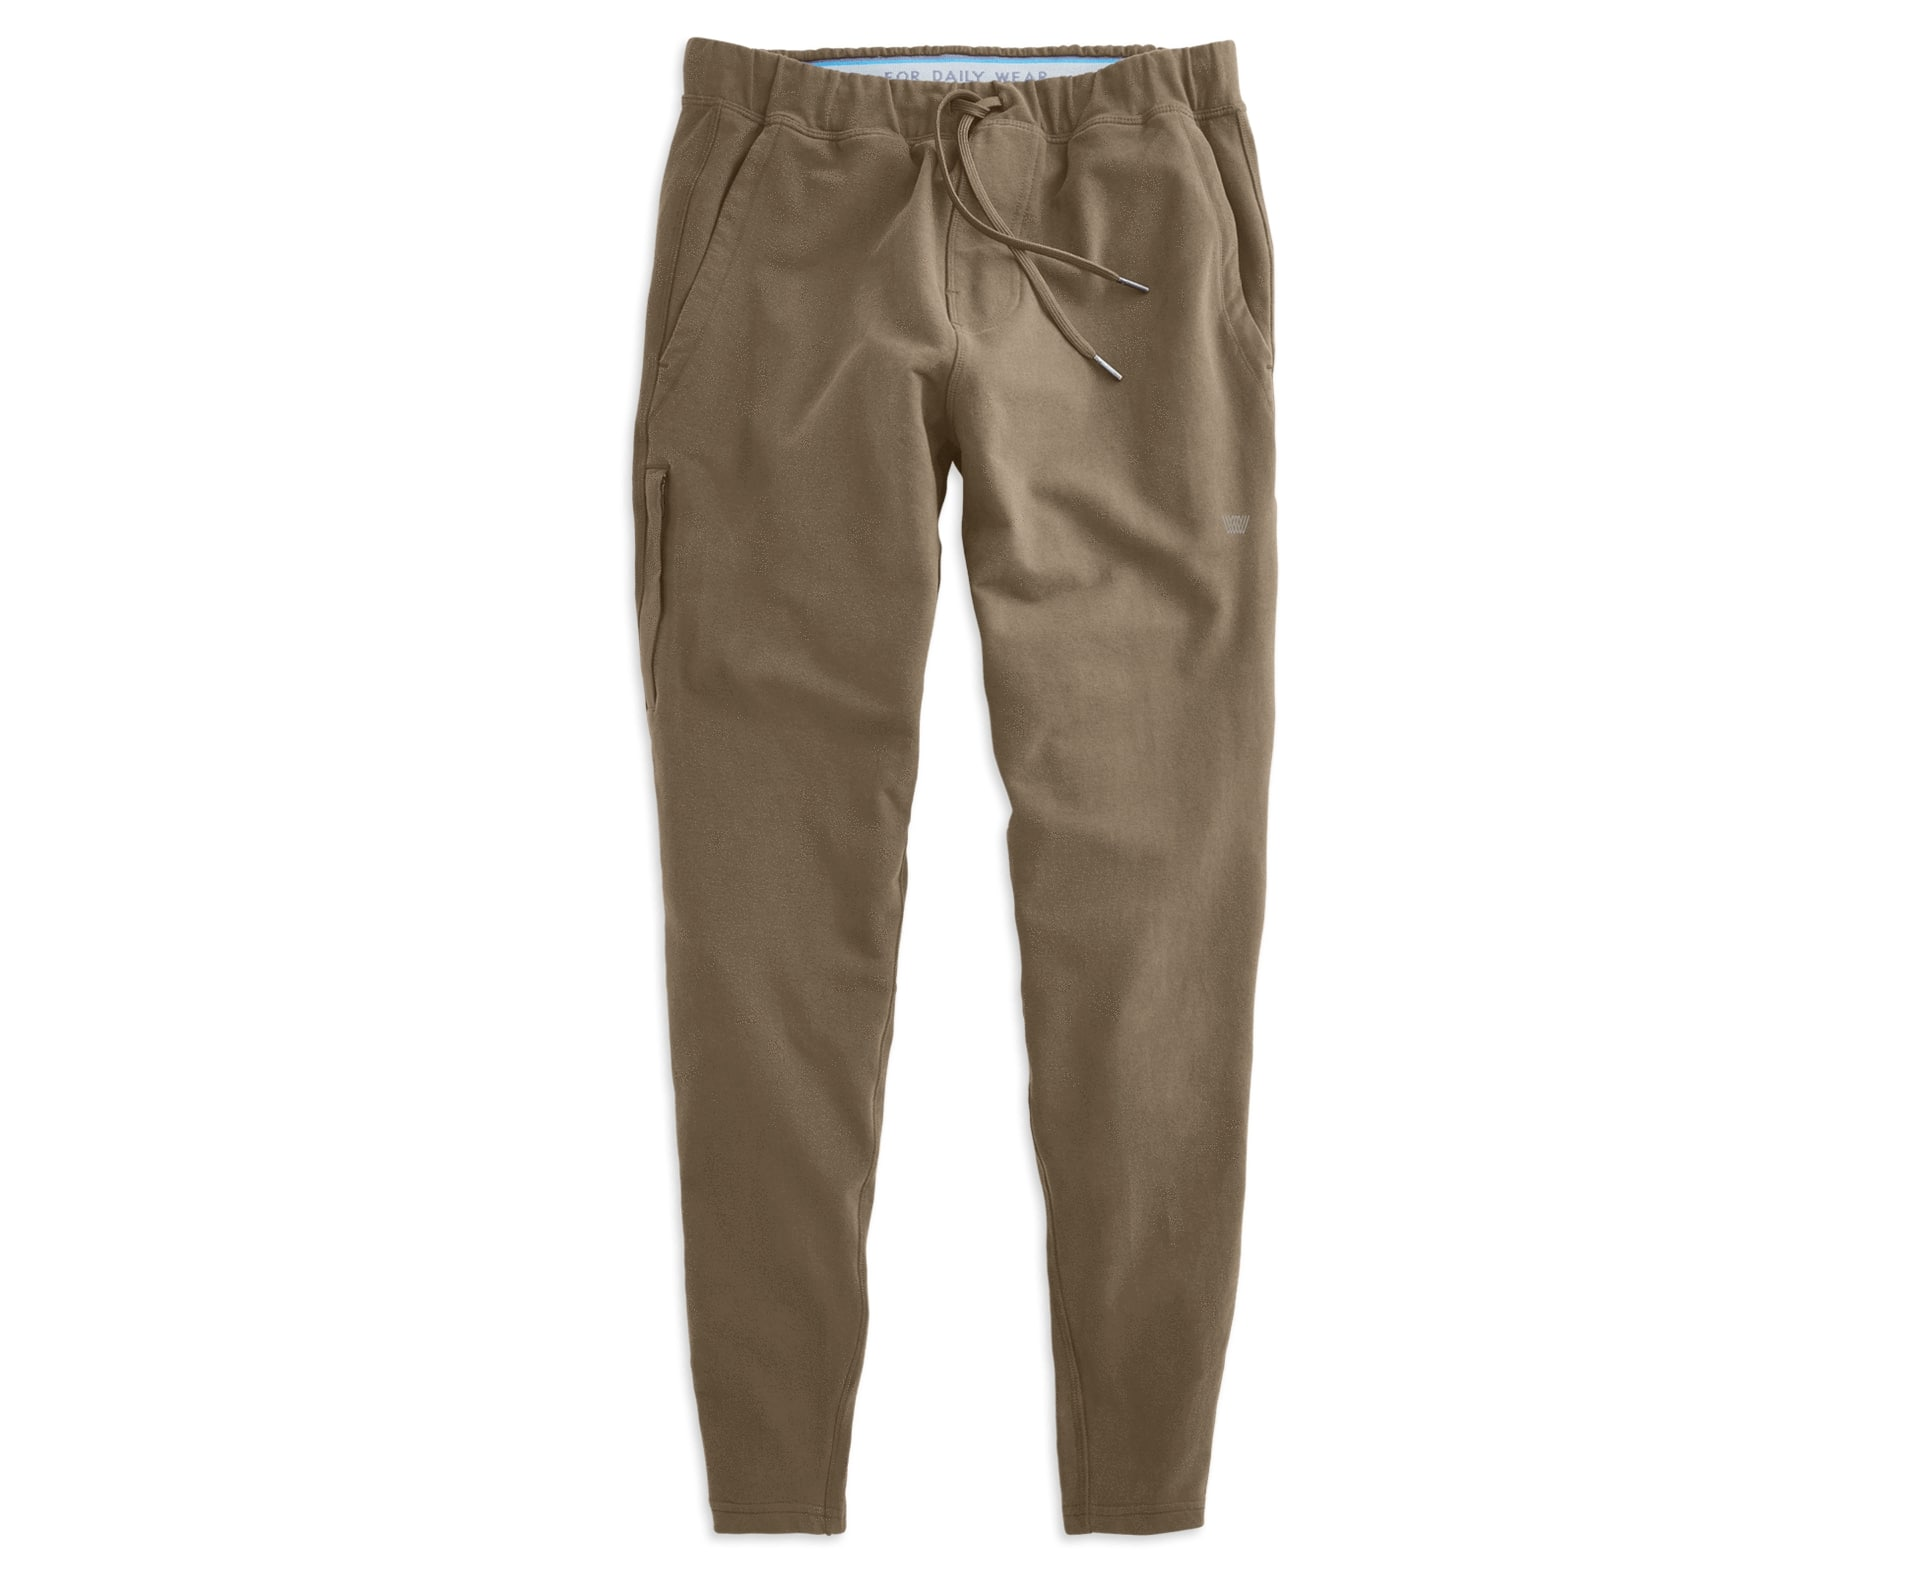 Mack Weldon Ace Sweatpant in light brown